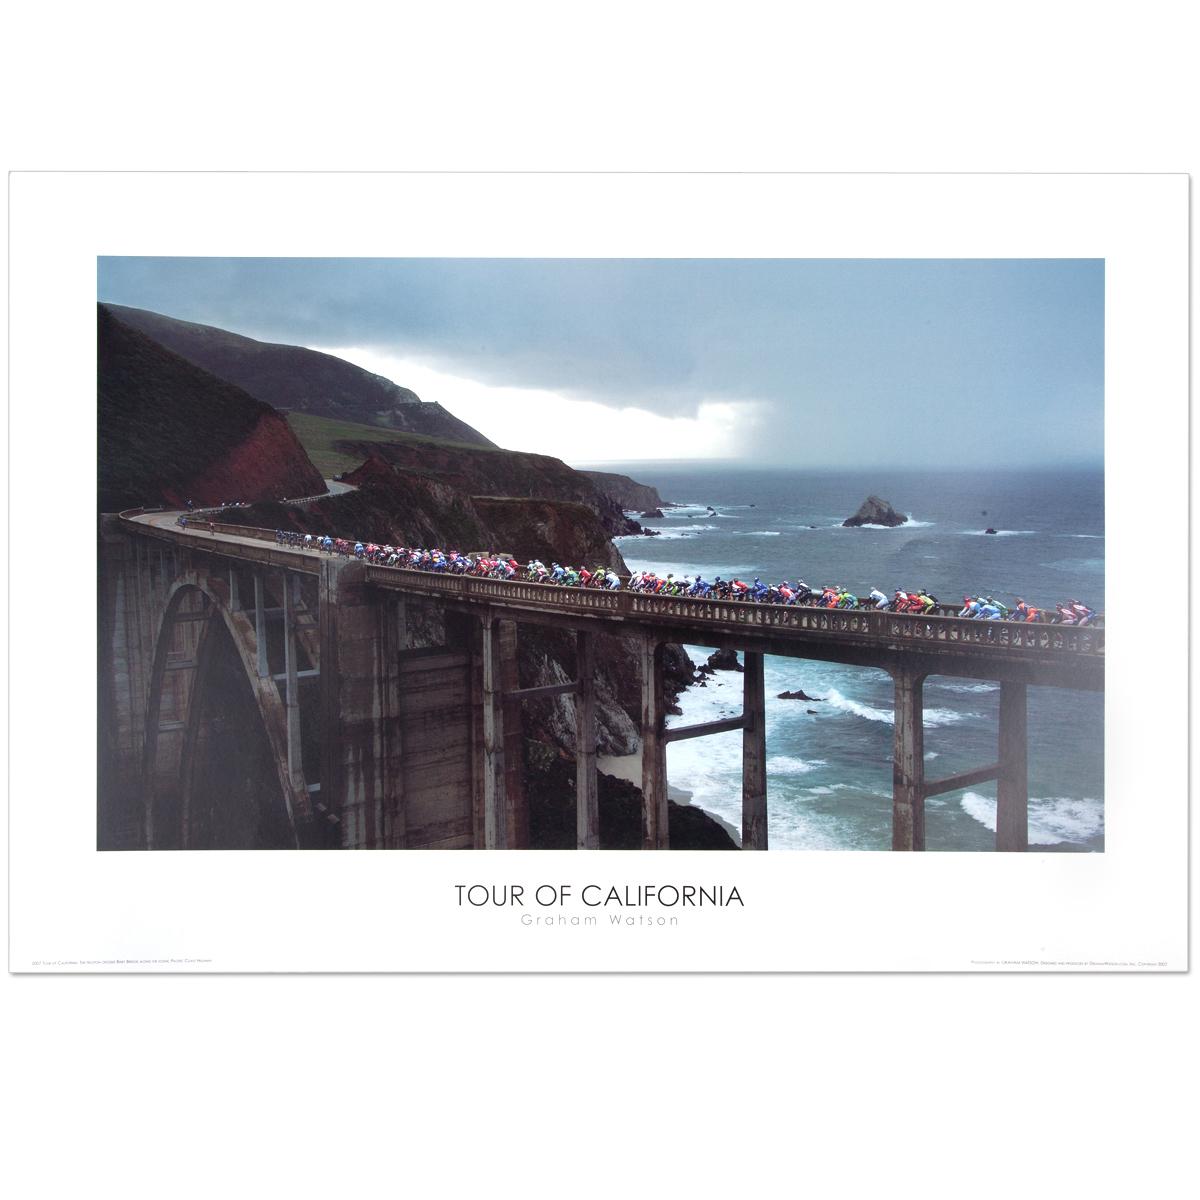 2007 Tour of California Poster